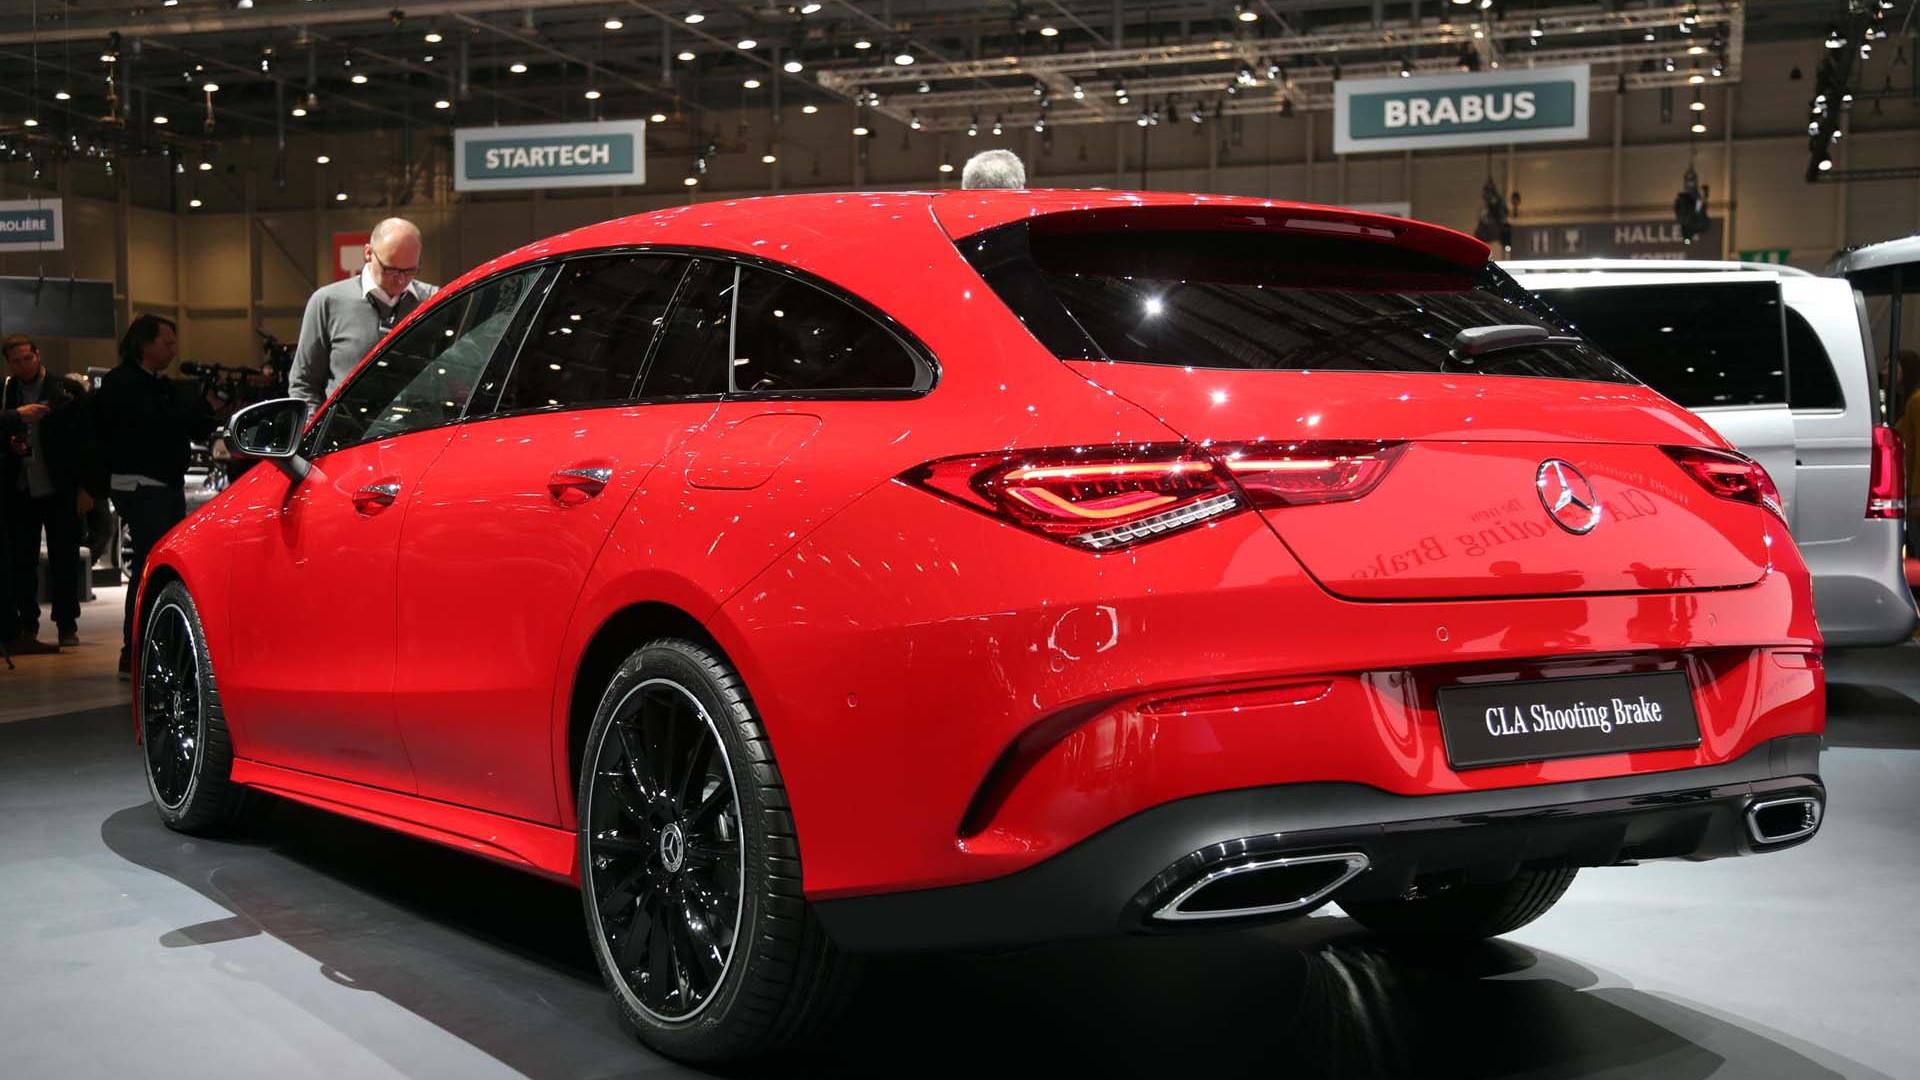 Mercedes-Benz CLA Shooting Brake, 2019 Geneva International Motor Show